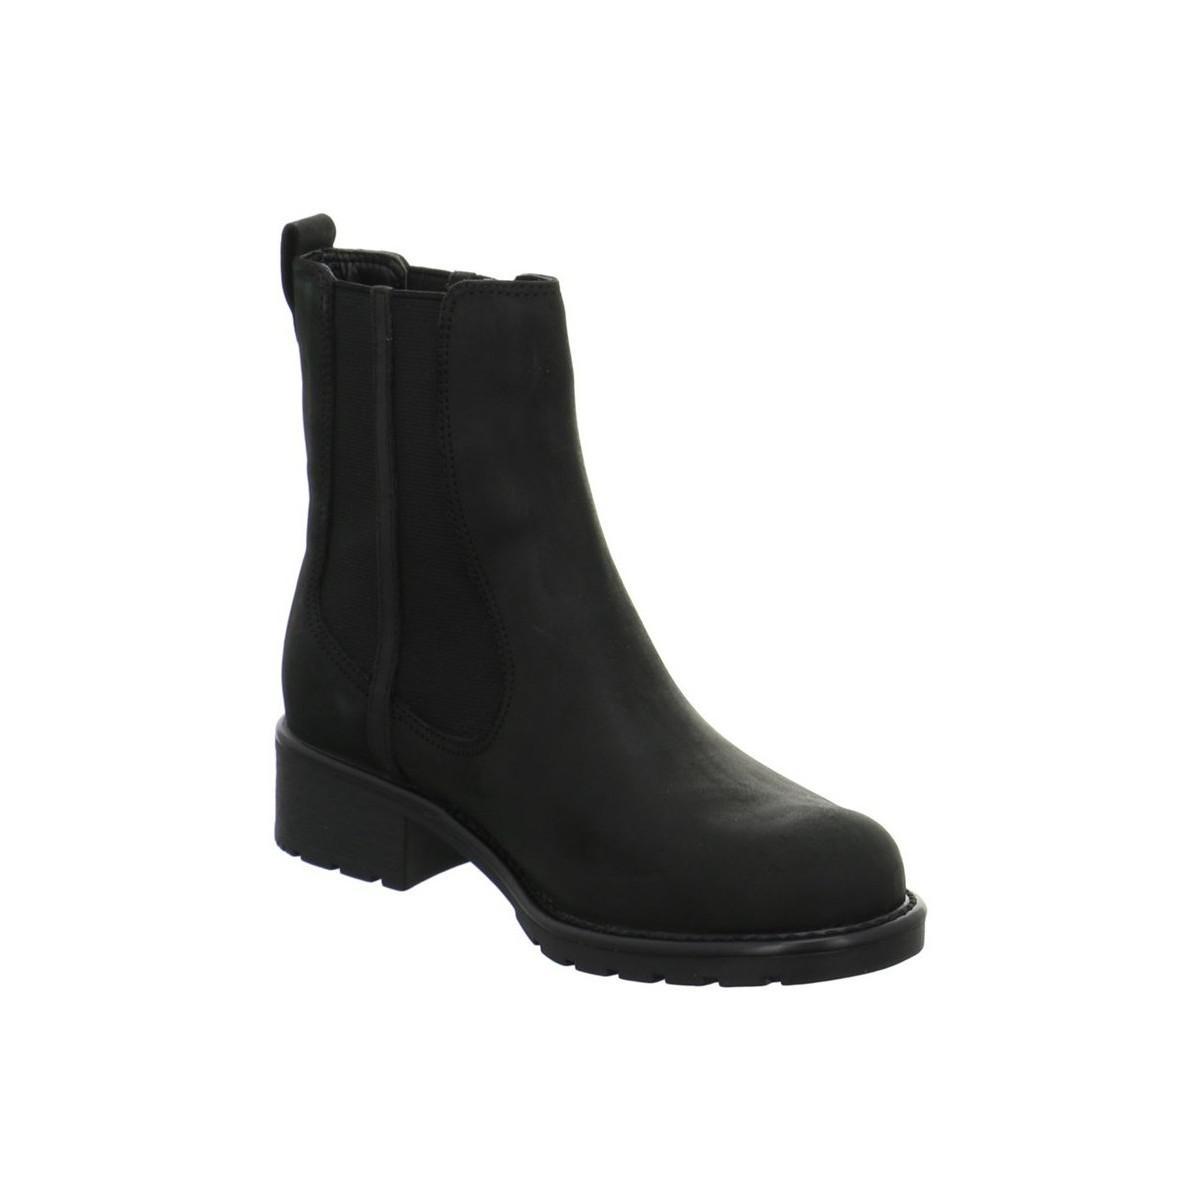 brand new eb18a b6c1c clarks-black-Orinoco-Hot-Womens-Mid-Boots-In-Black.jpeg